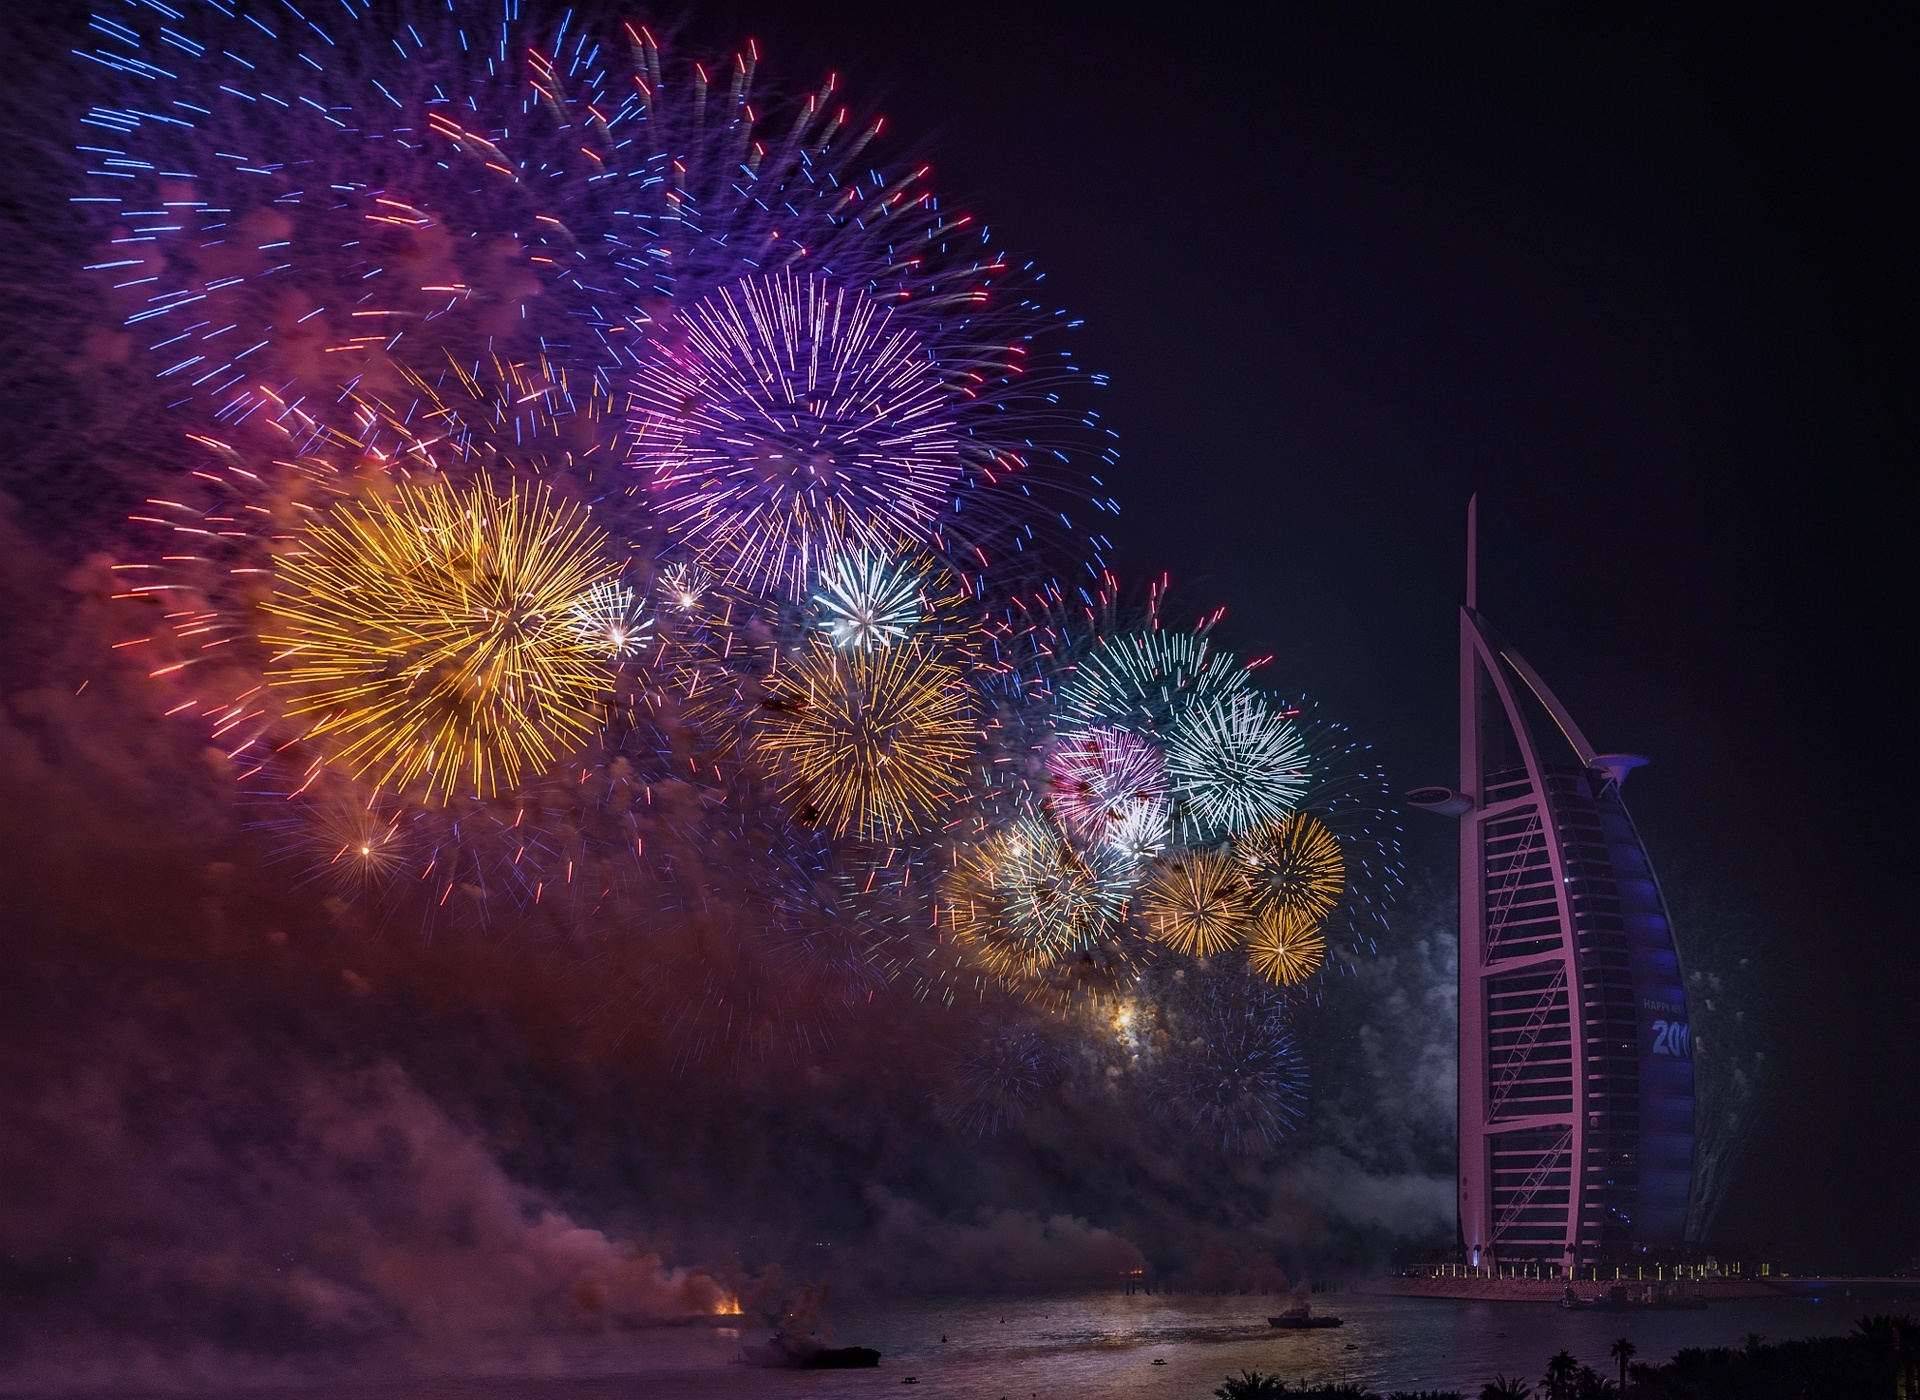 Building Burj Al Arab Dubai Fireworks Night United Arab Emirates 1920x1400